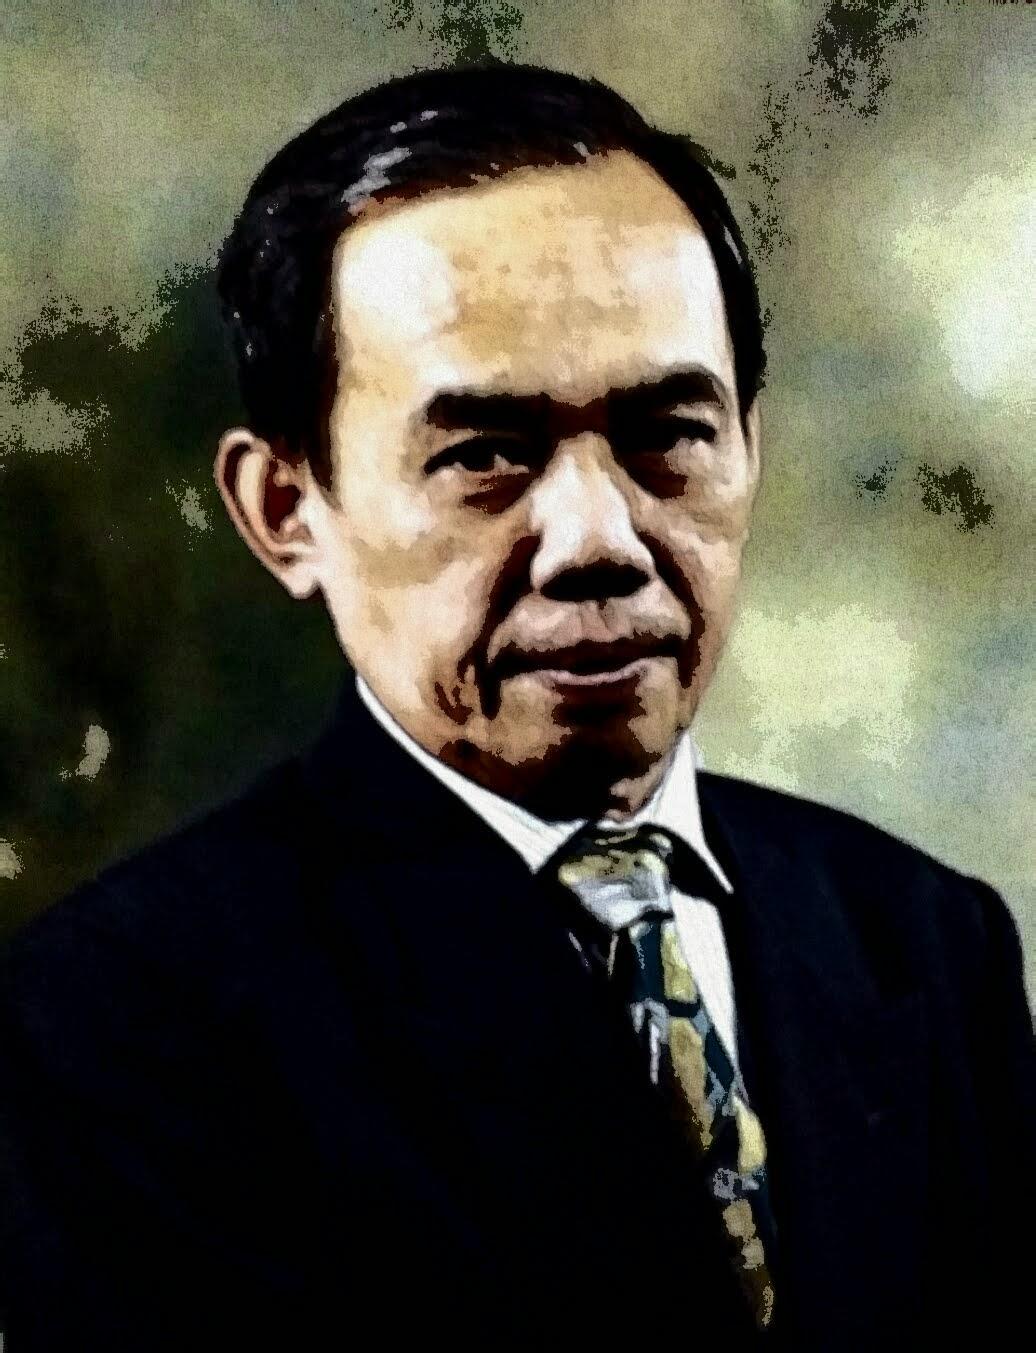 Hj.Mokhtar b. Abdul Rahman